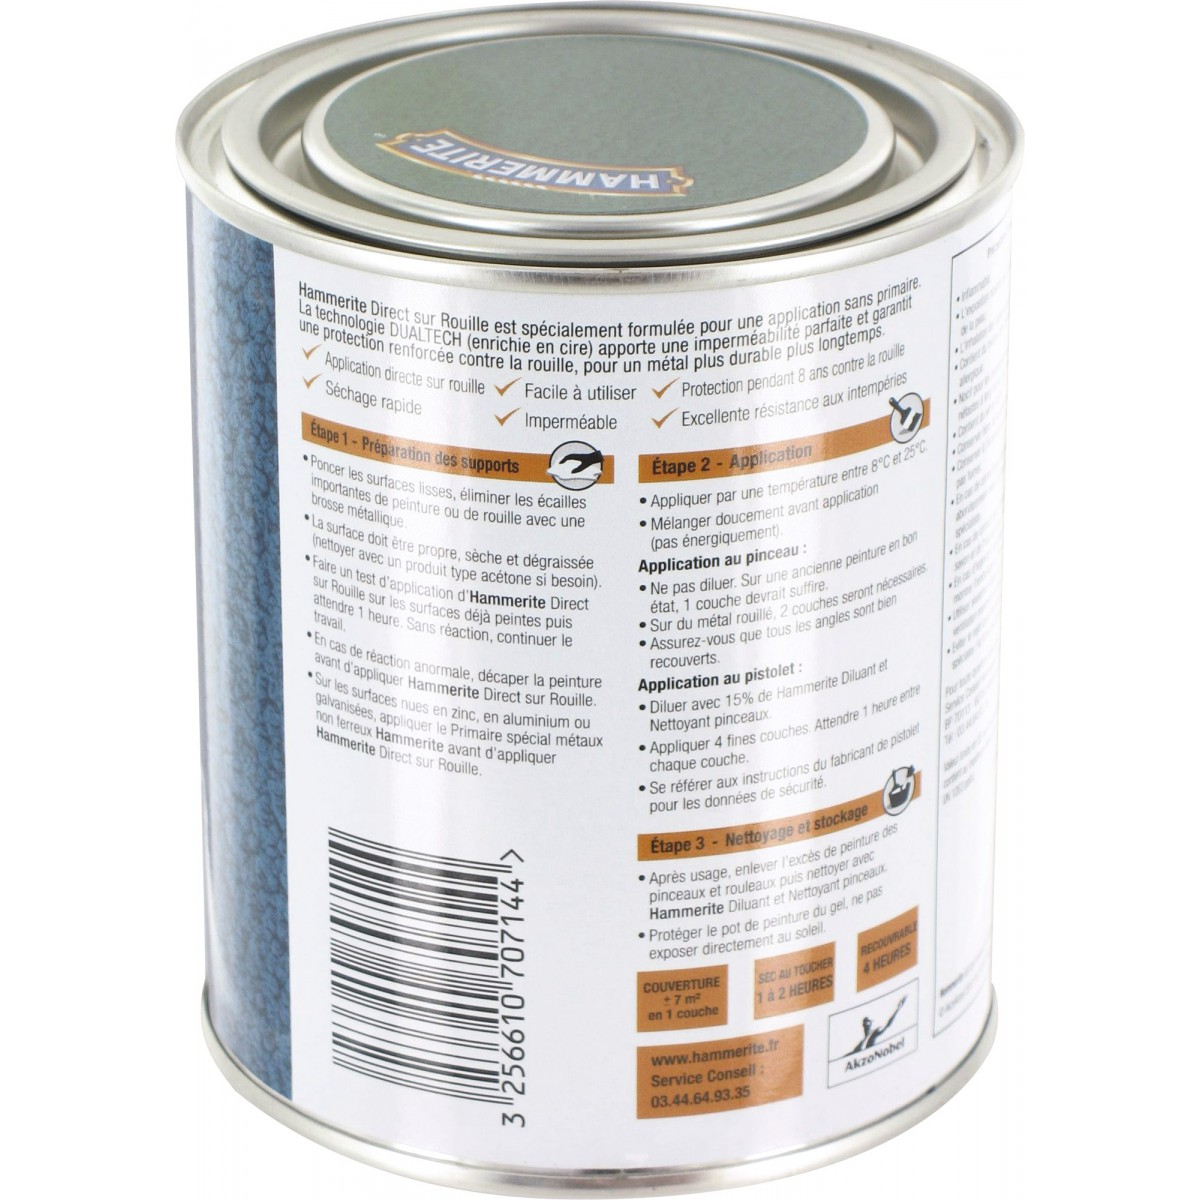 Peinture martelée Hammerite - Boîte 750 ml - Vert épicéa